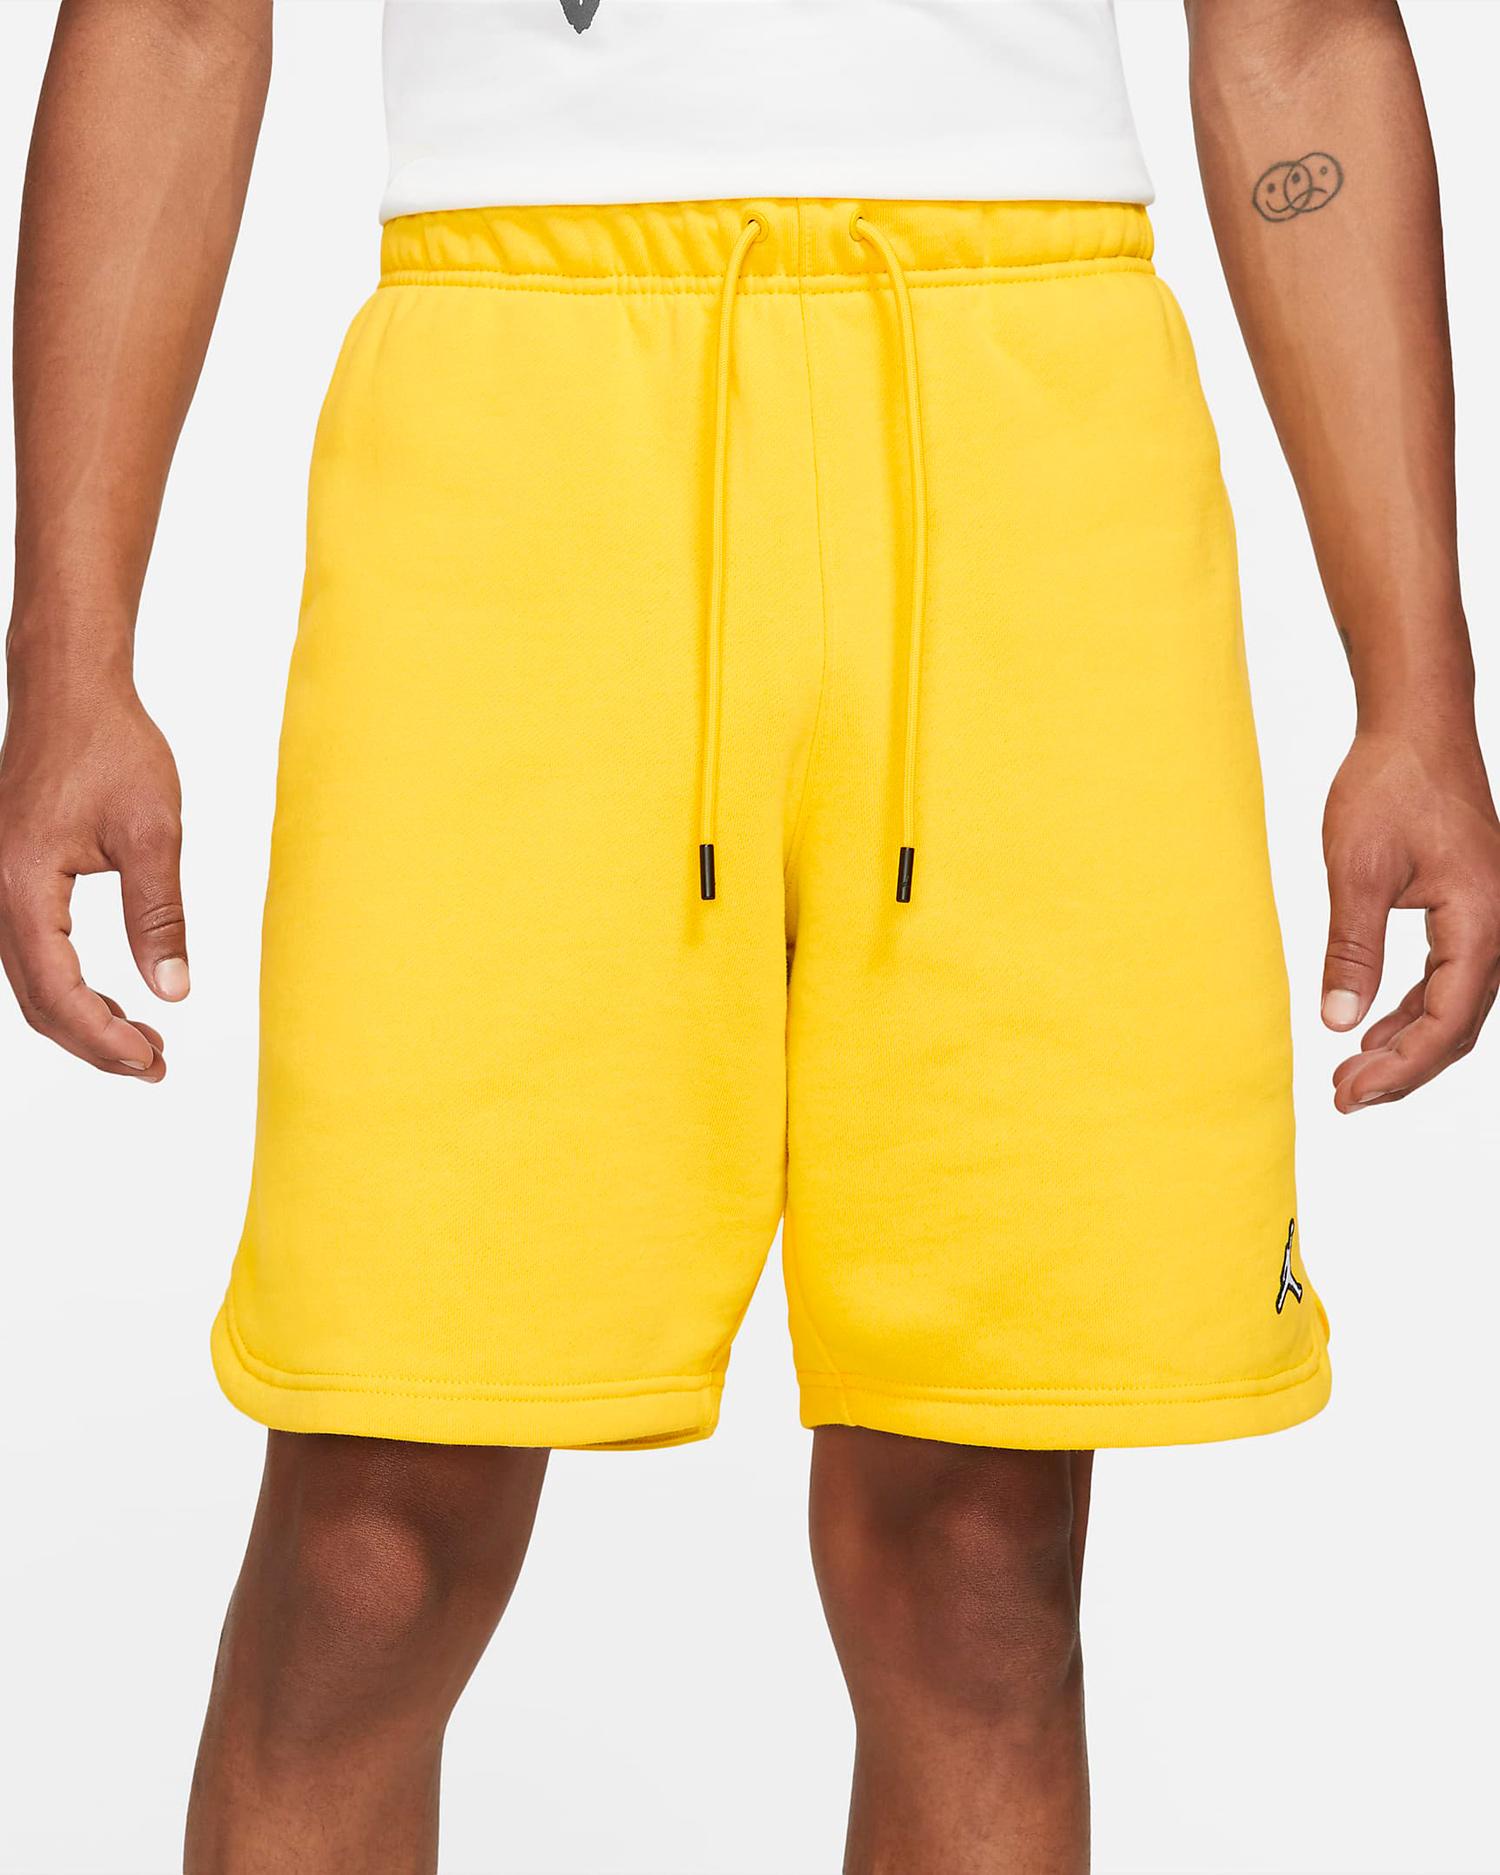 jordan-essential-fleece-shorts-tour-yellow-1